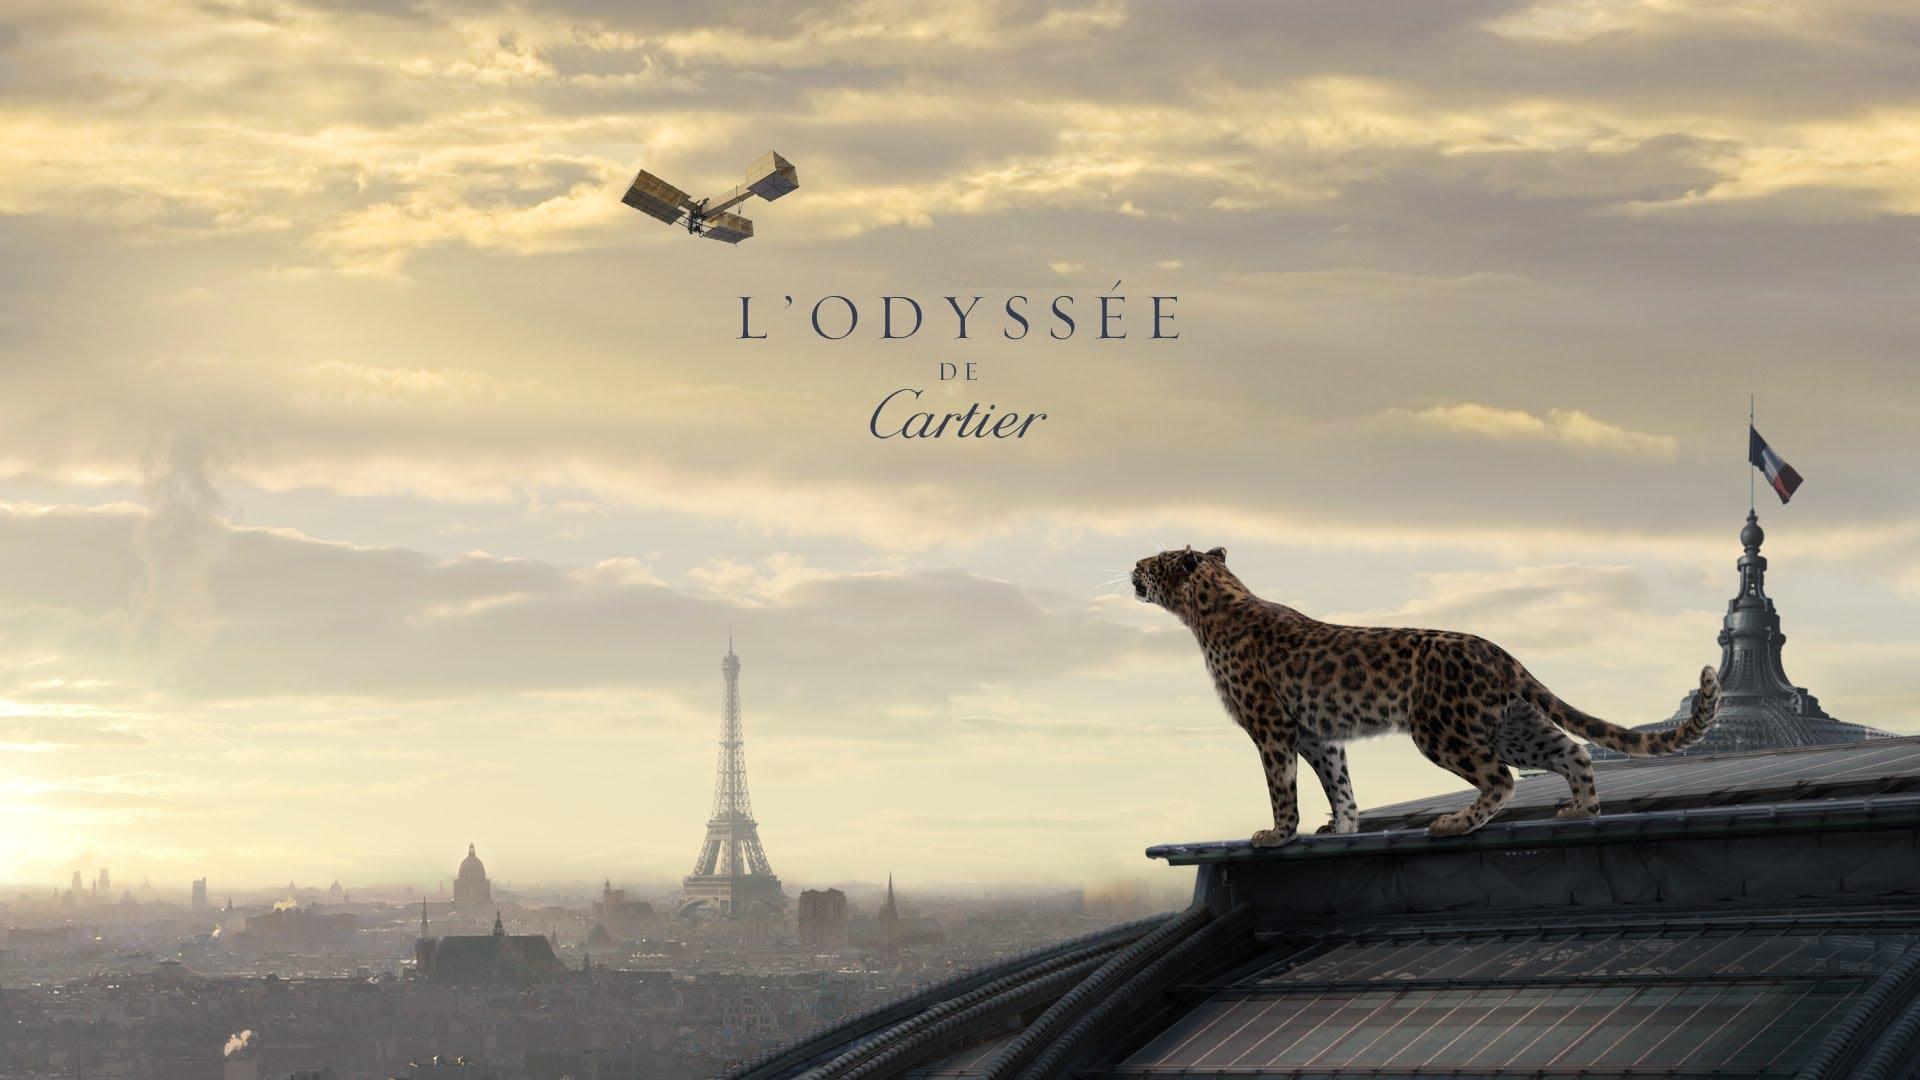 L'Odyssée de Cartier Advertising